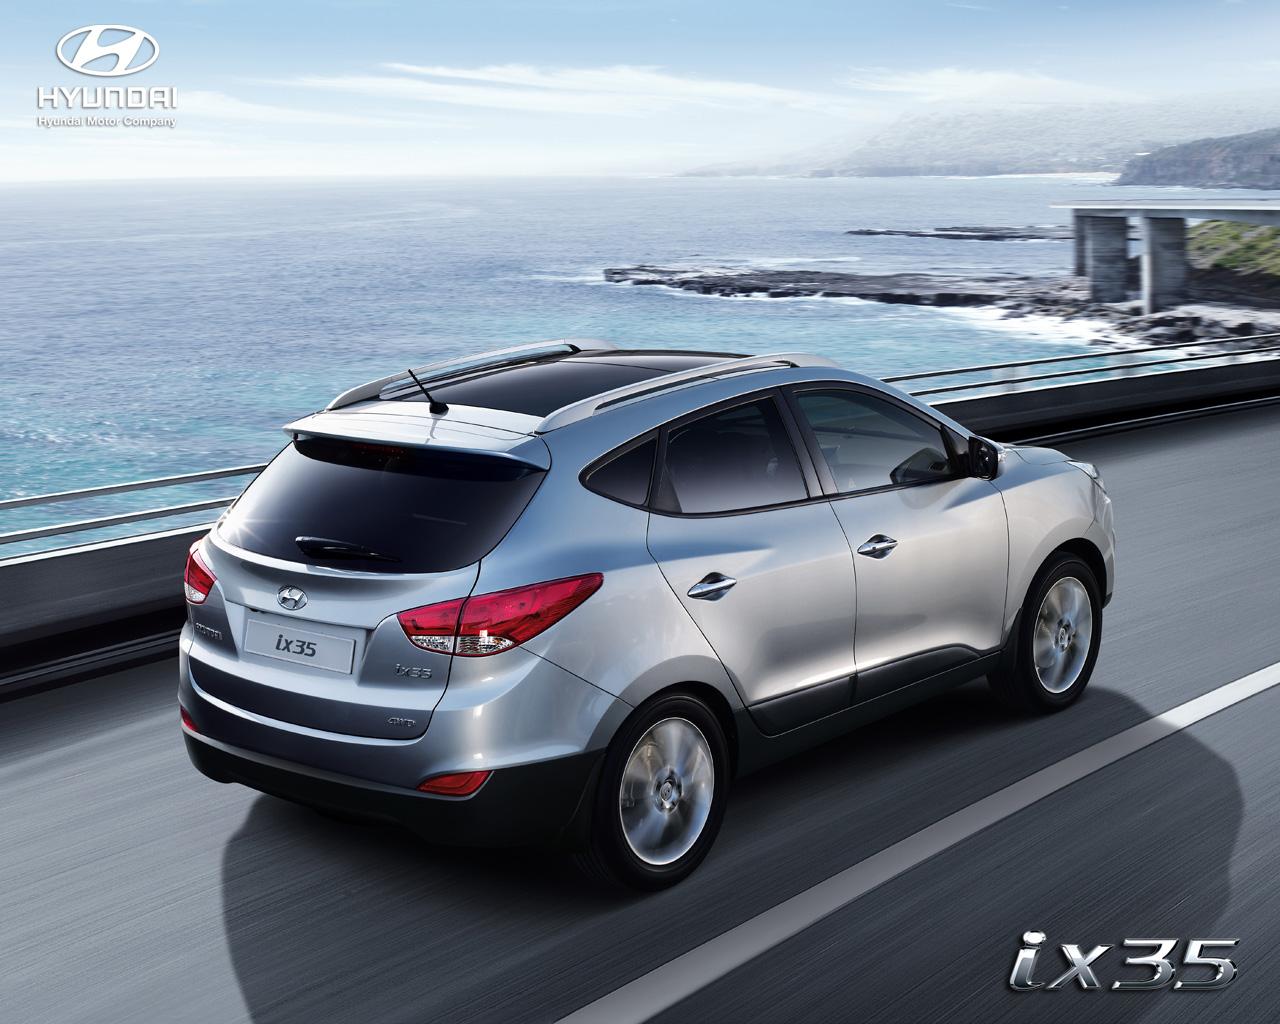 Hyundai Ix >> Index of /hyundai/ix35/fotos